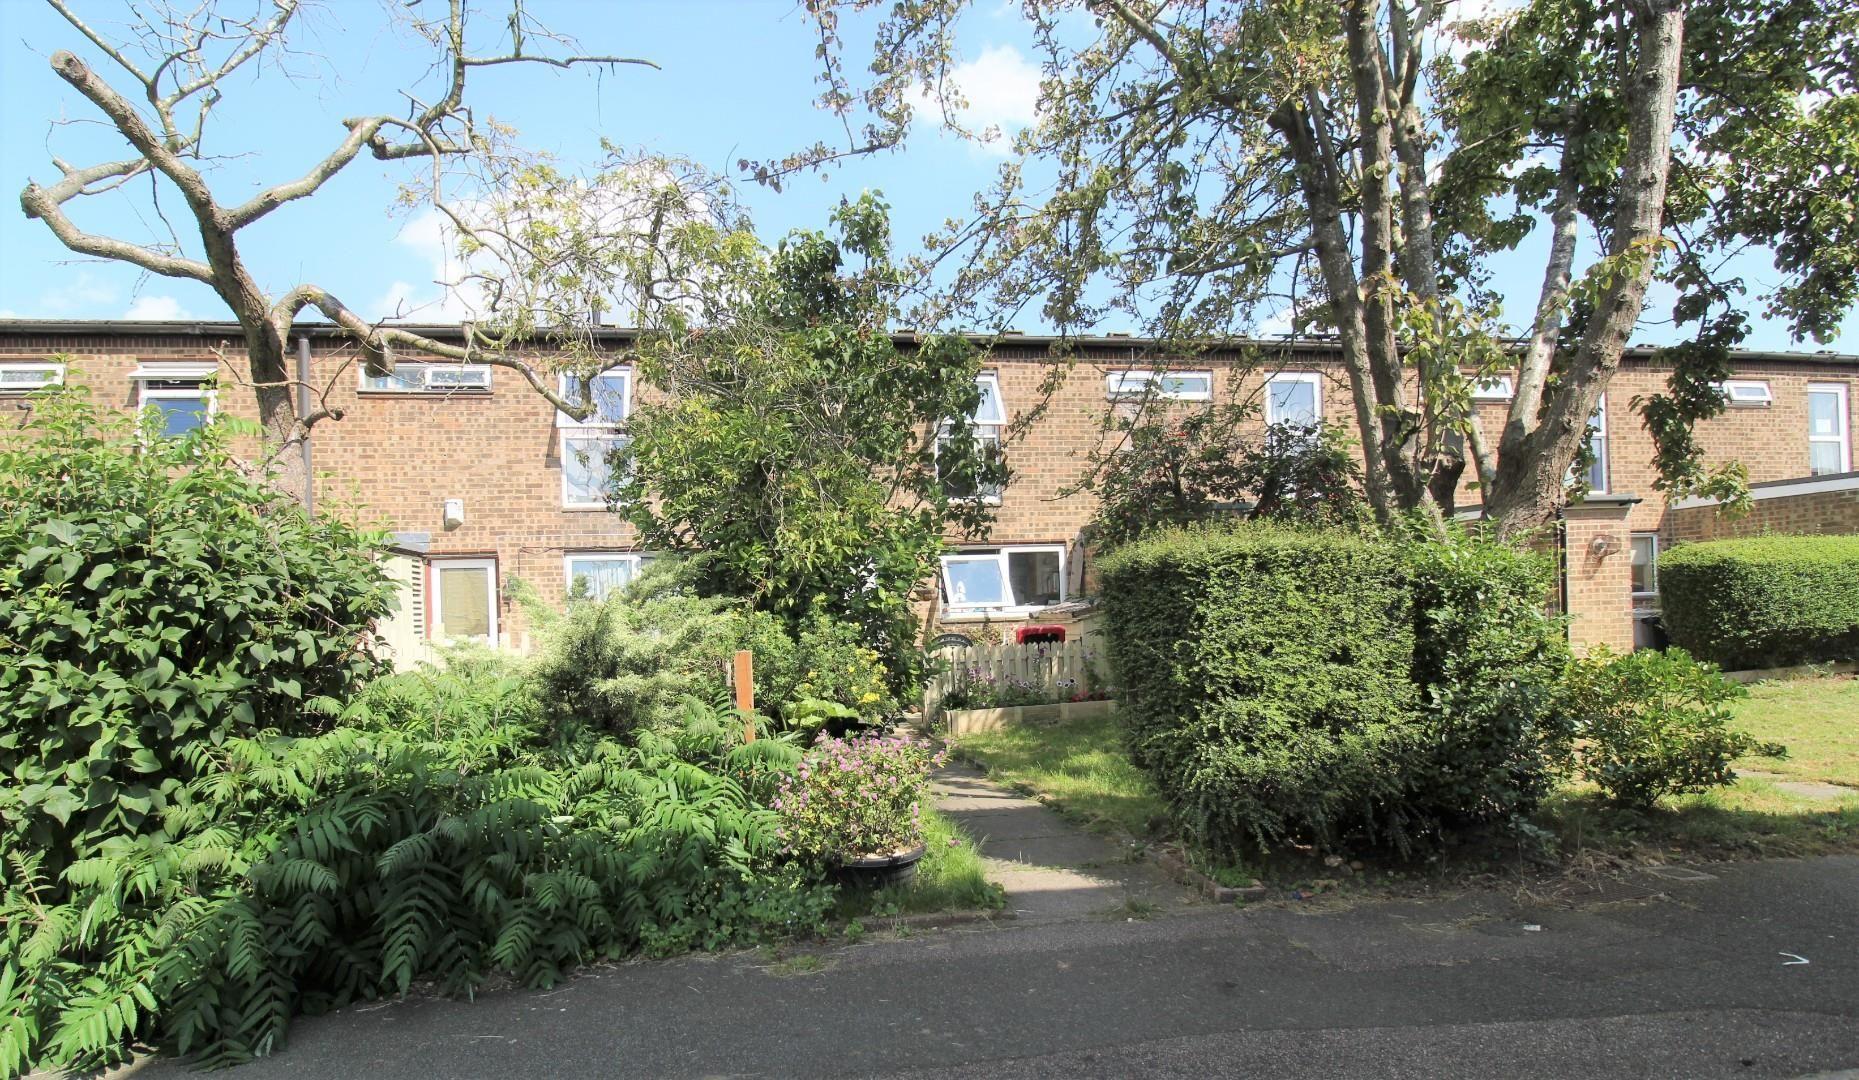 Property photo 1 of 17. Img_3664.Jpg